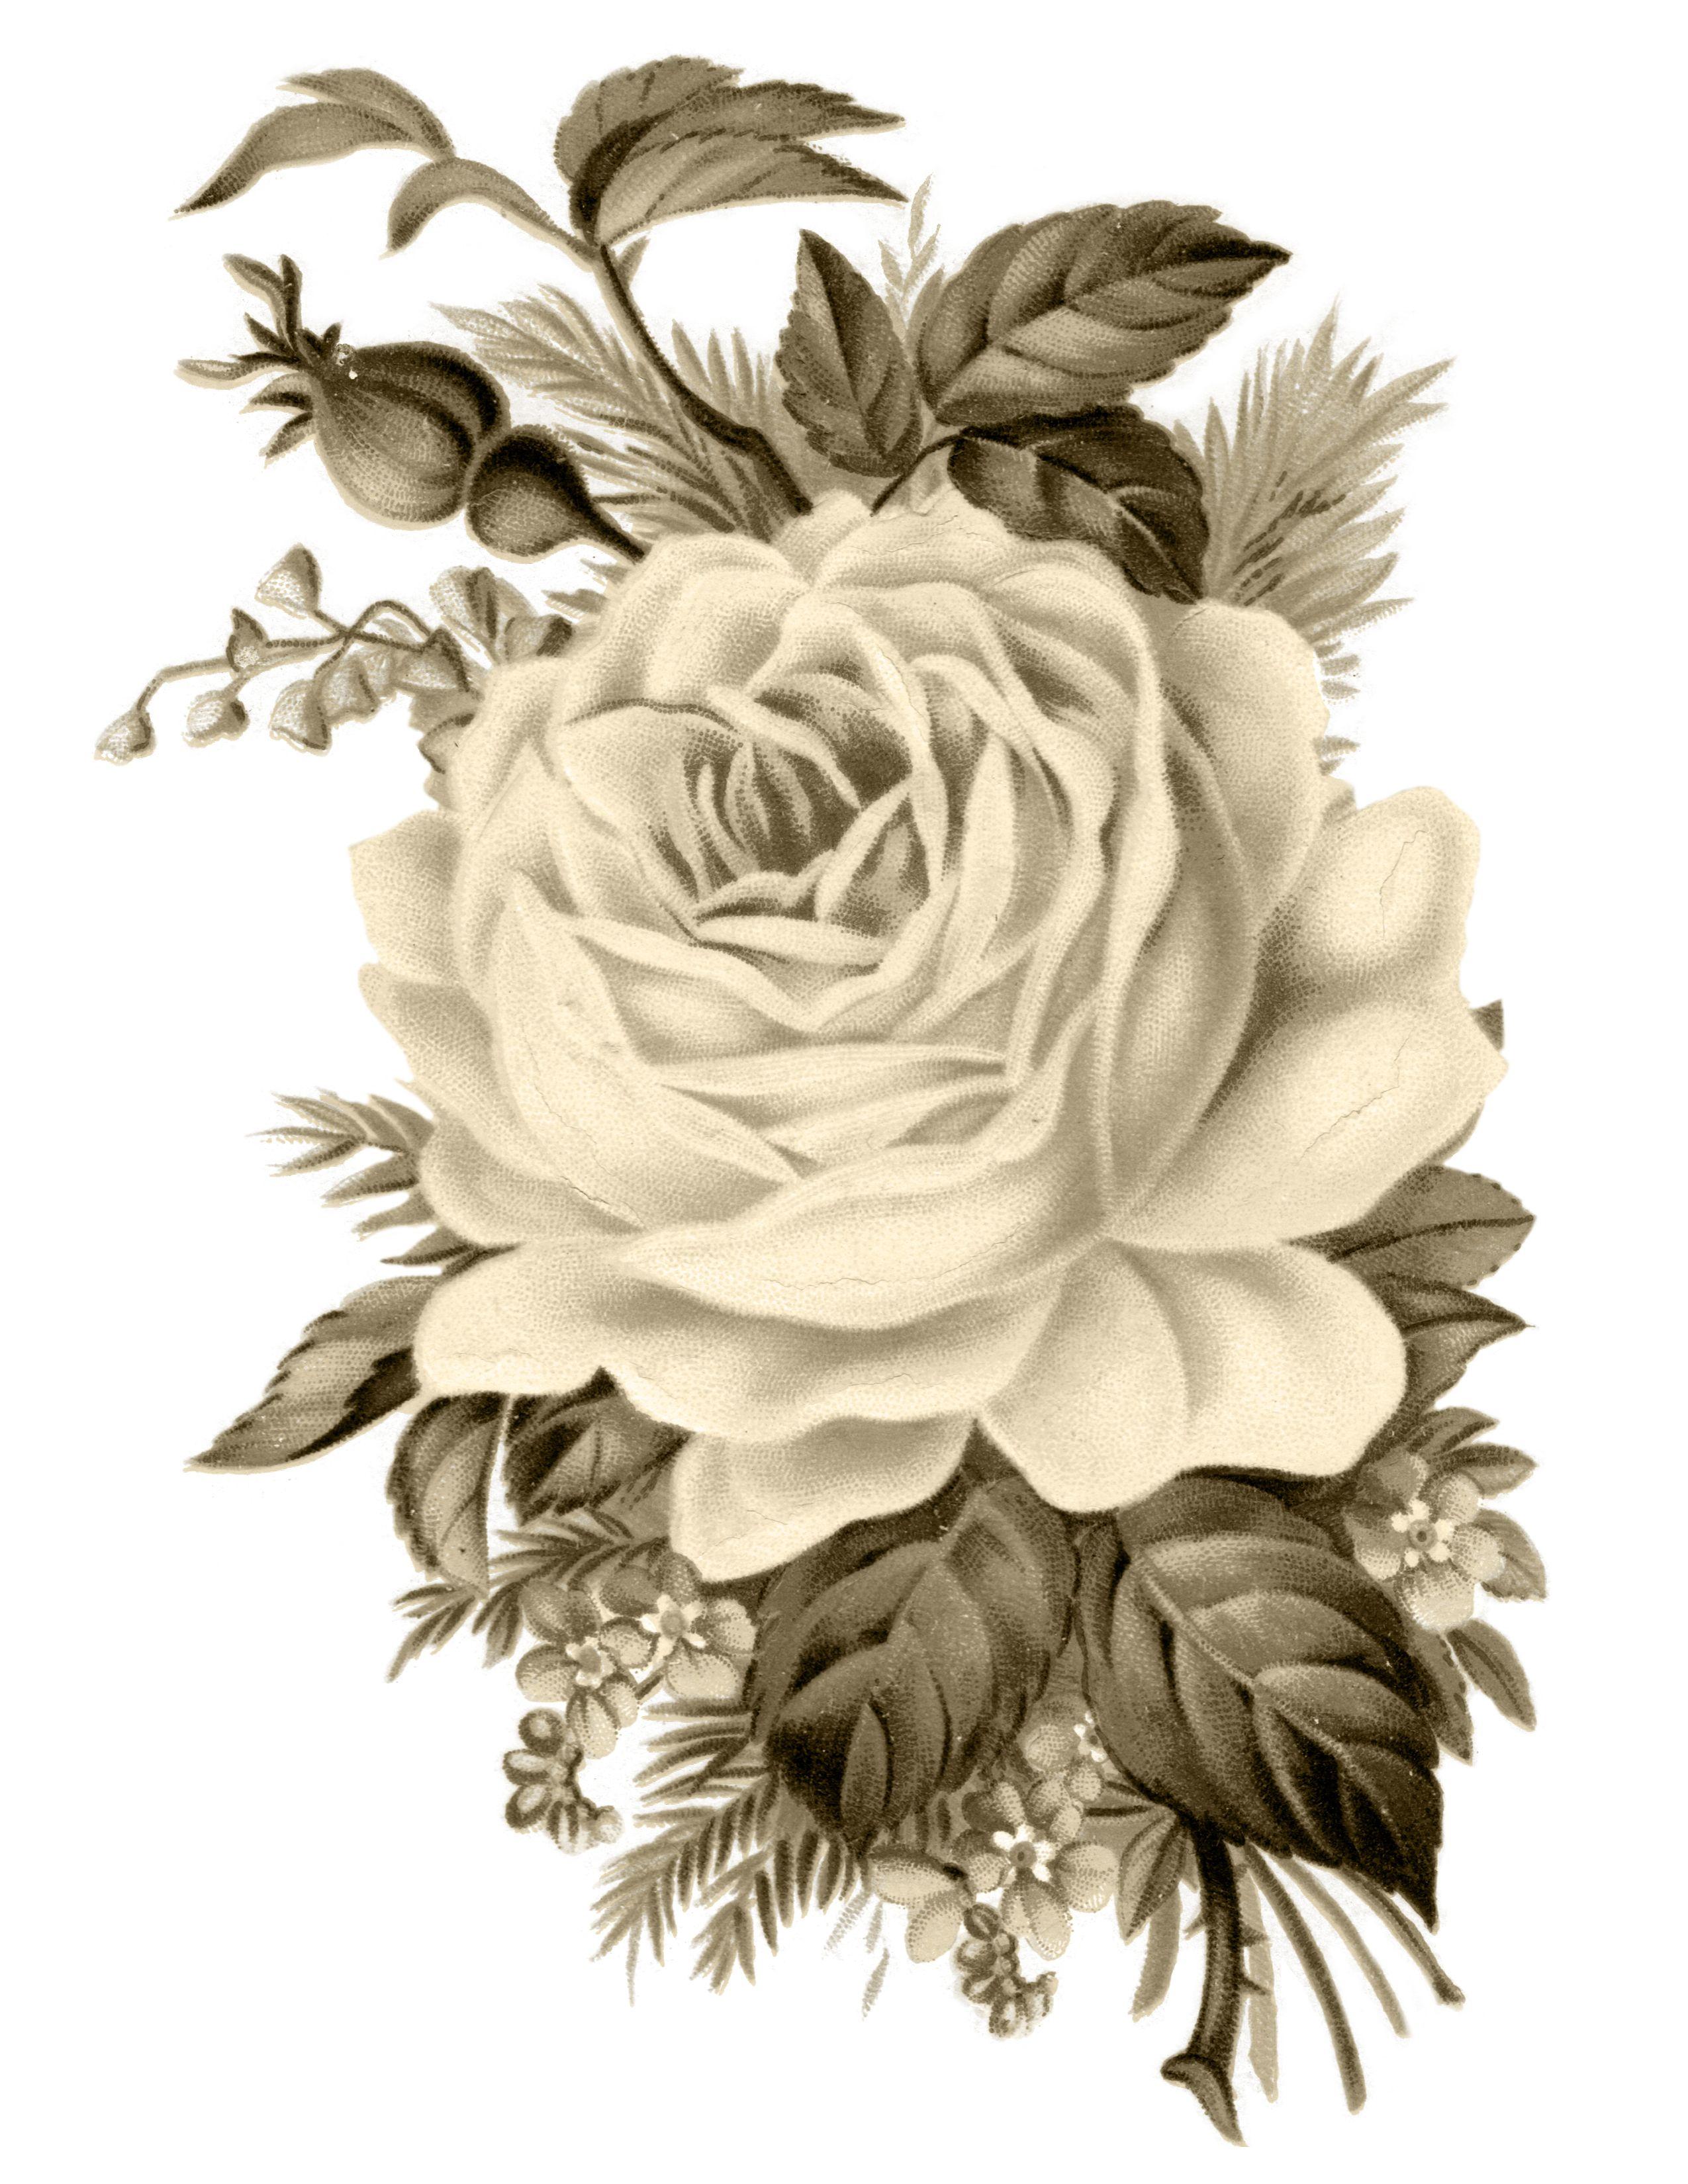 Clip Art: Royalty Free Gorgeous Vintage Rose Image.